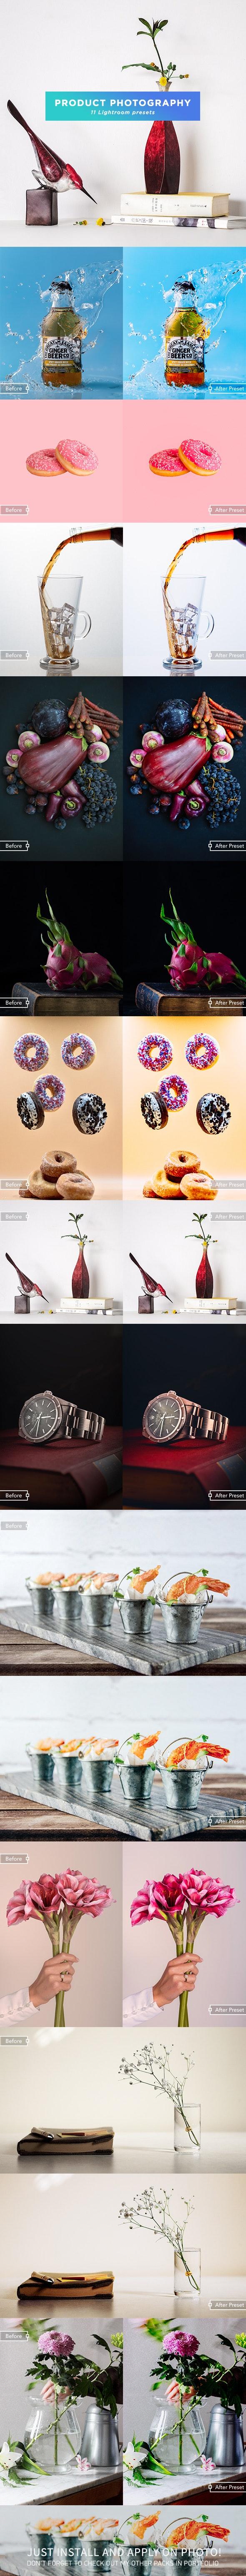 11 Product Photography Lightroom Presets - Lightroom Presets Add-ons